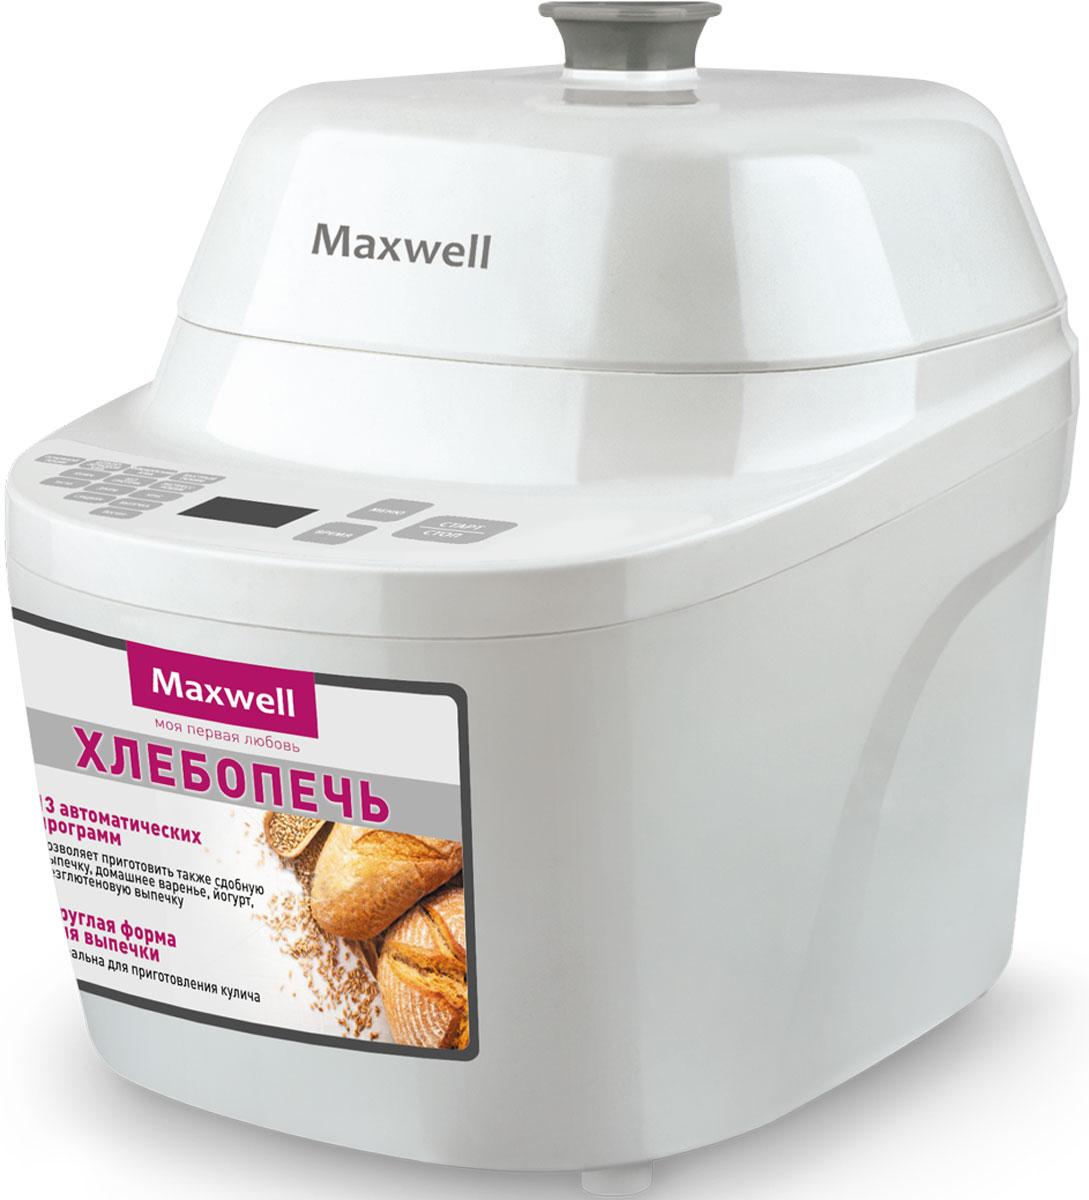 Maxwell MW-3755(W) хлебопечь - Хлебопечки